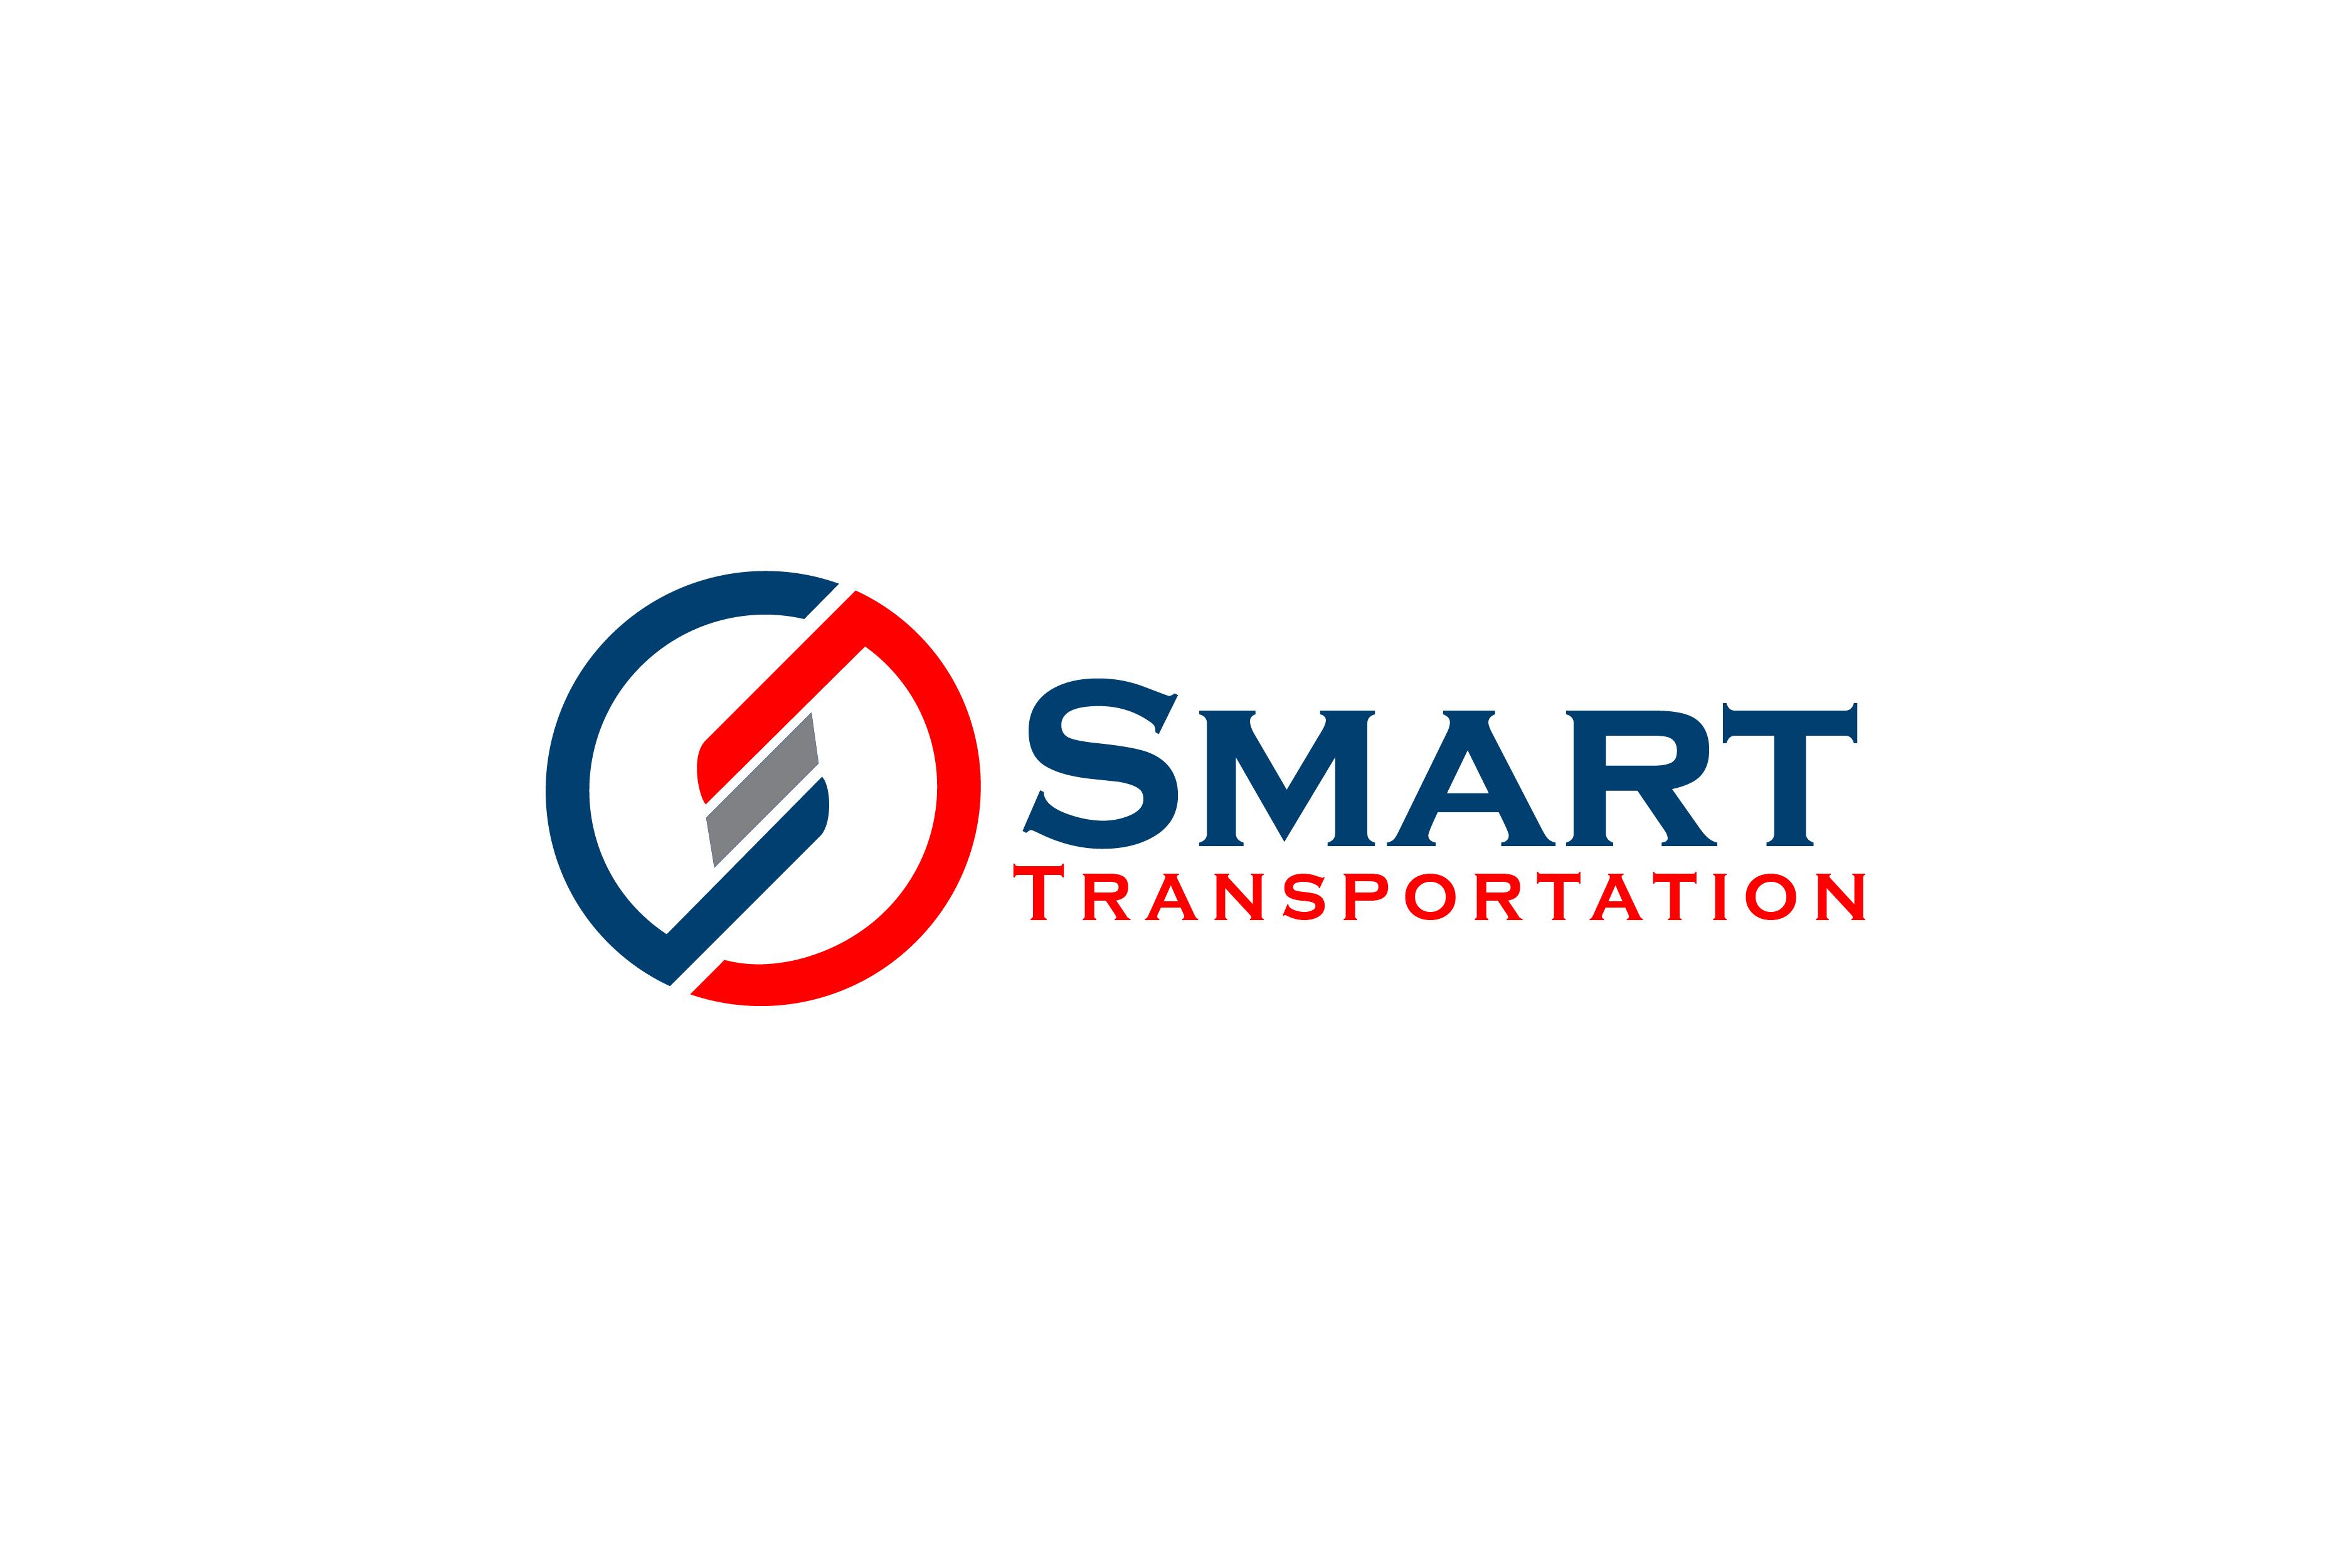 Logo Design by Private User - Entry No. 160 in the Logo Design Contest Imaginative Logo Design for Smart Transportation.